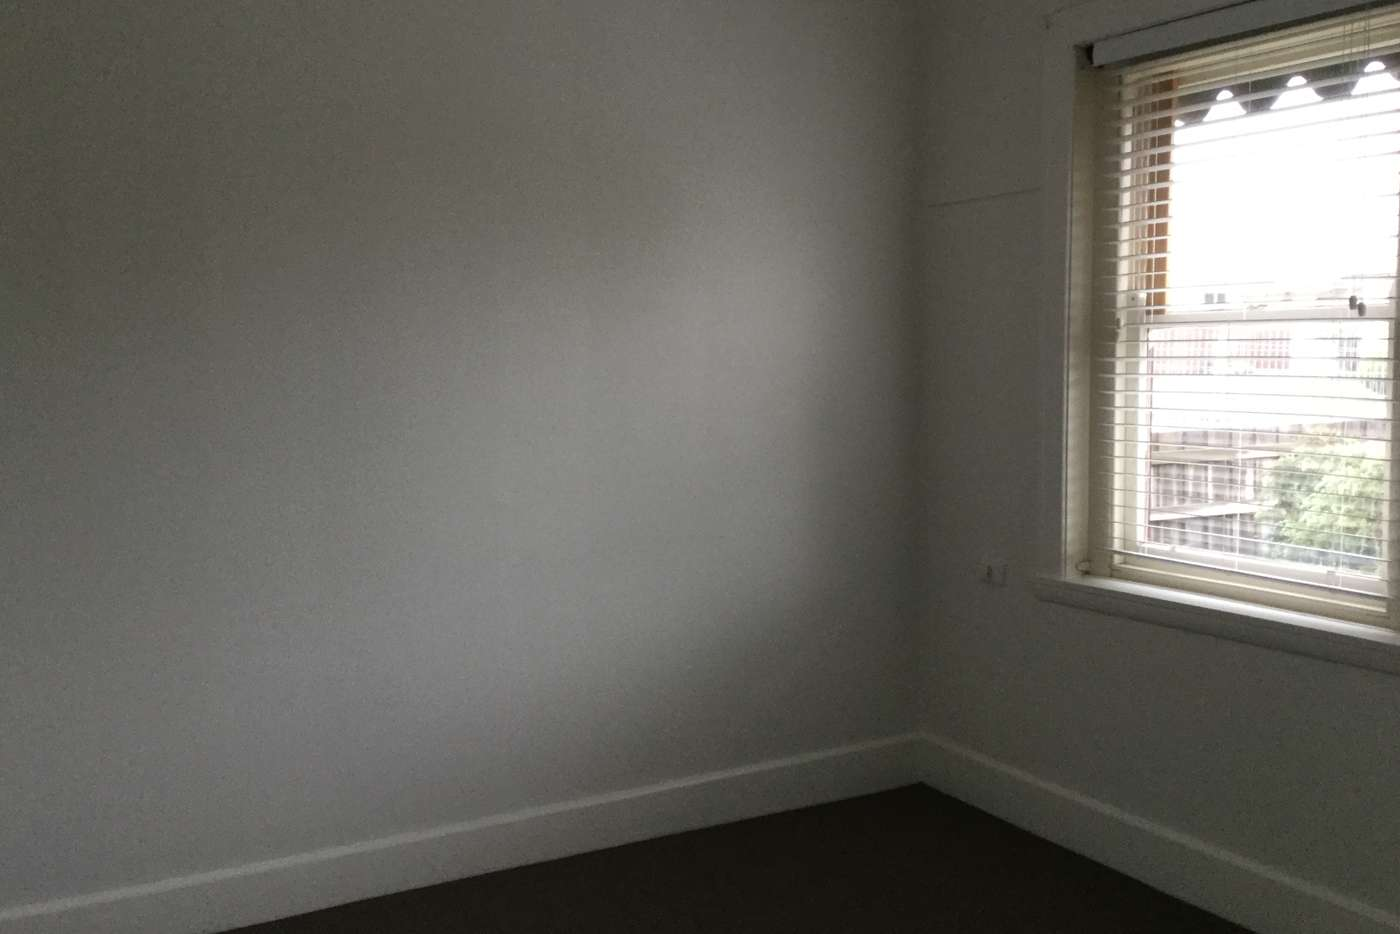 Sixth view of Homely house listing, 16 Victoria Street, Sebastopol VIC 3356